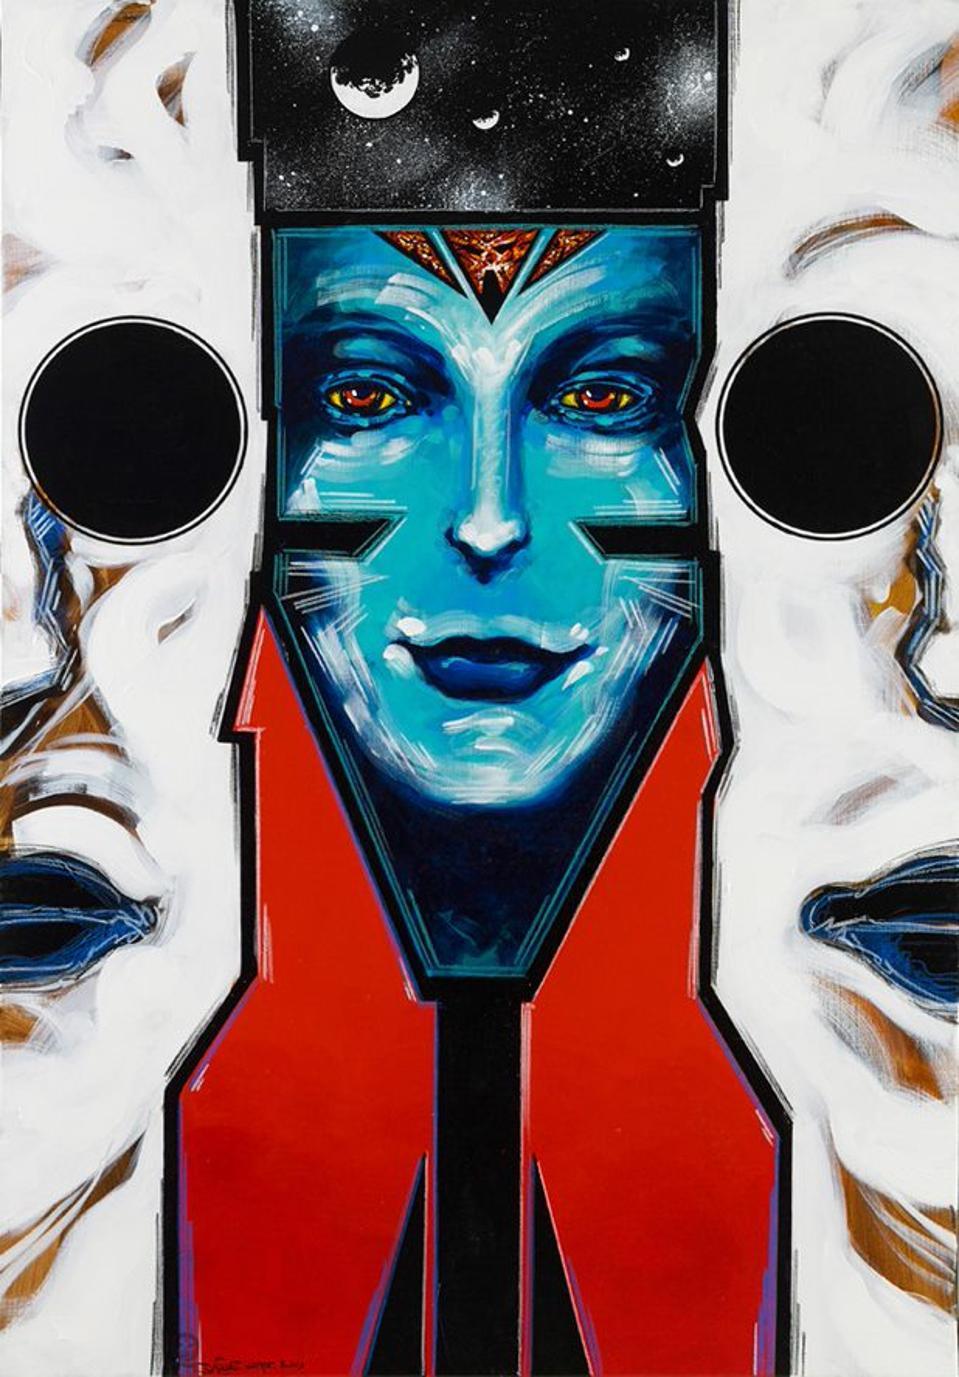 Philippe Druillet's painting ″Loane Sloane 8″